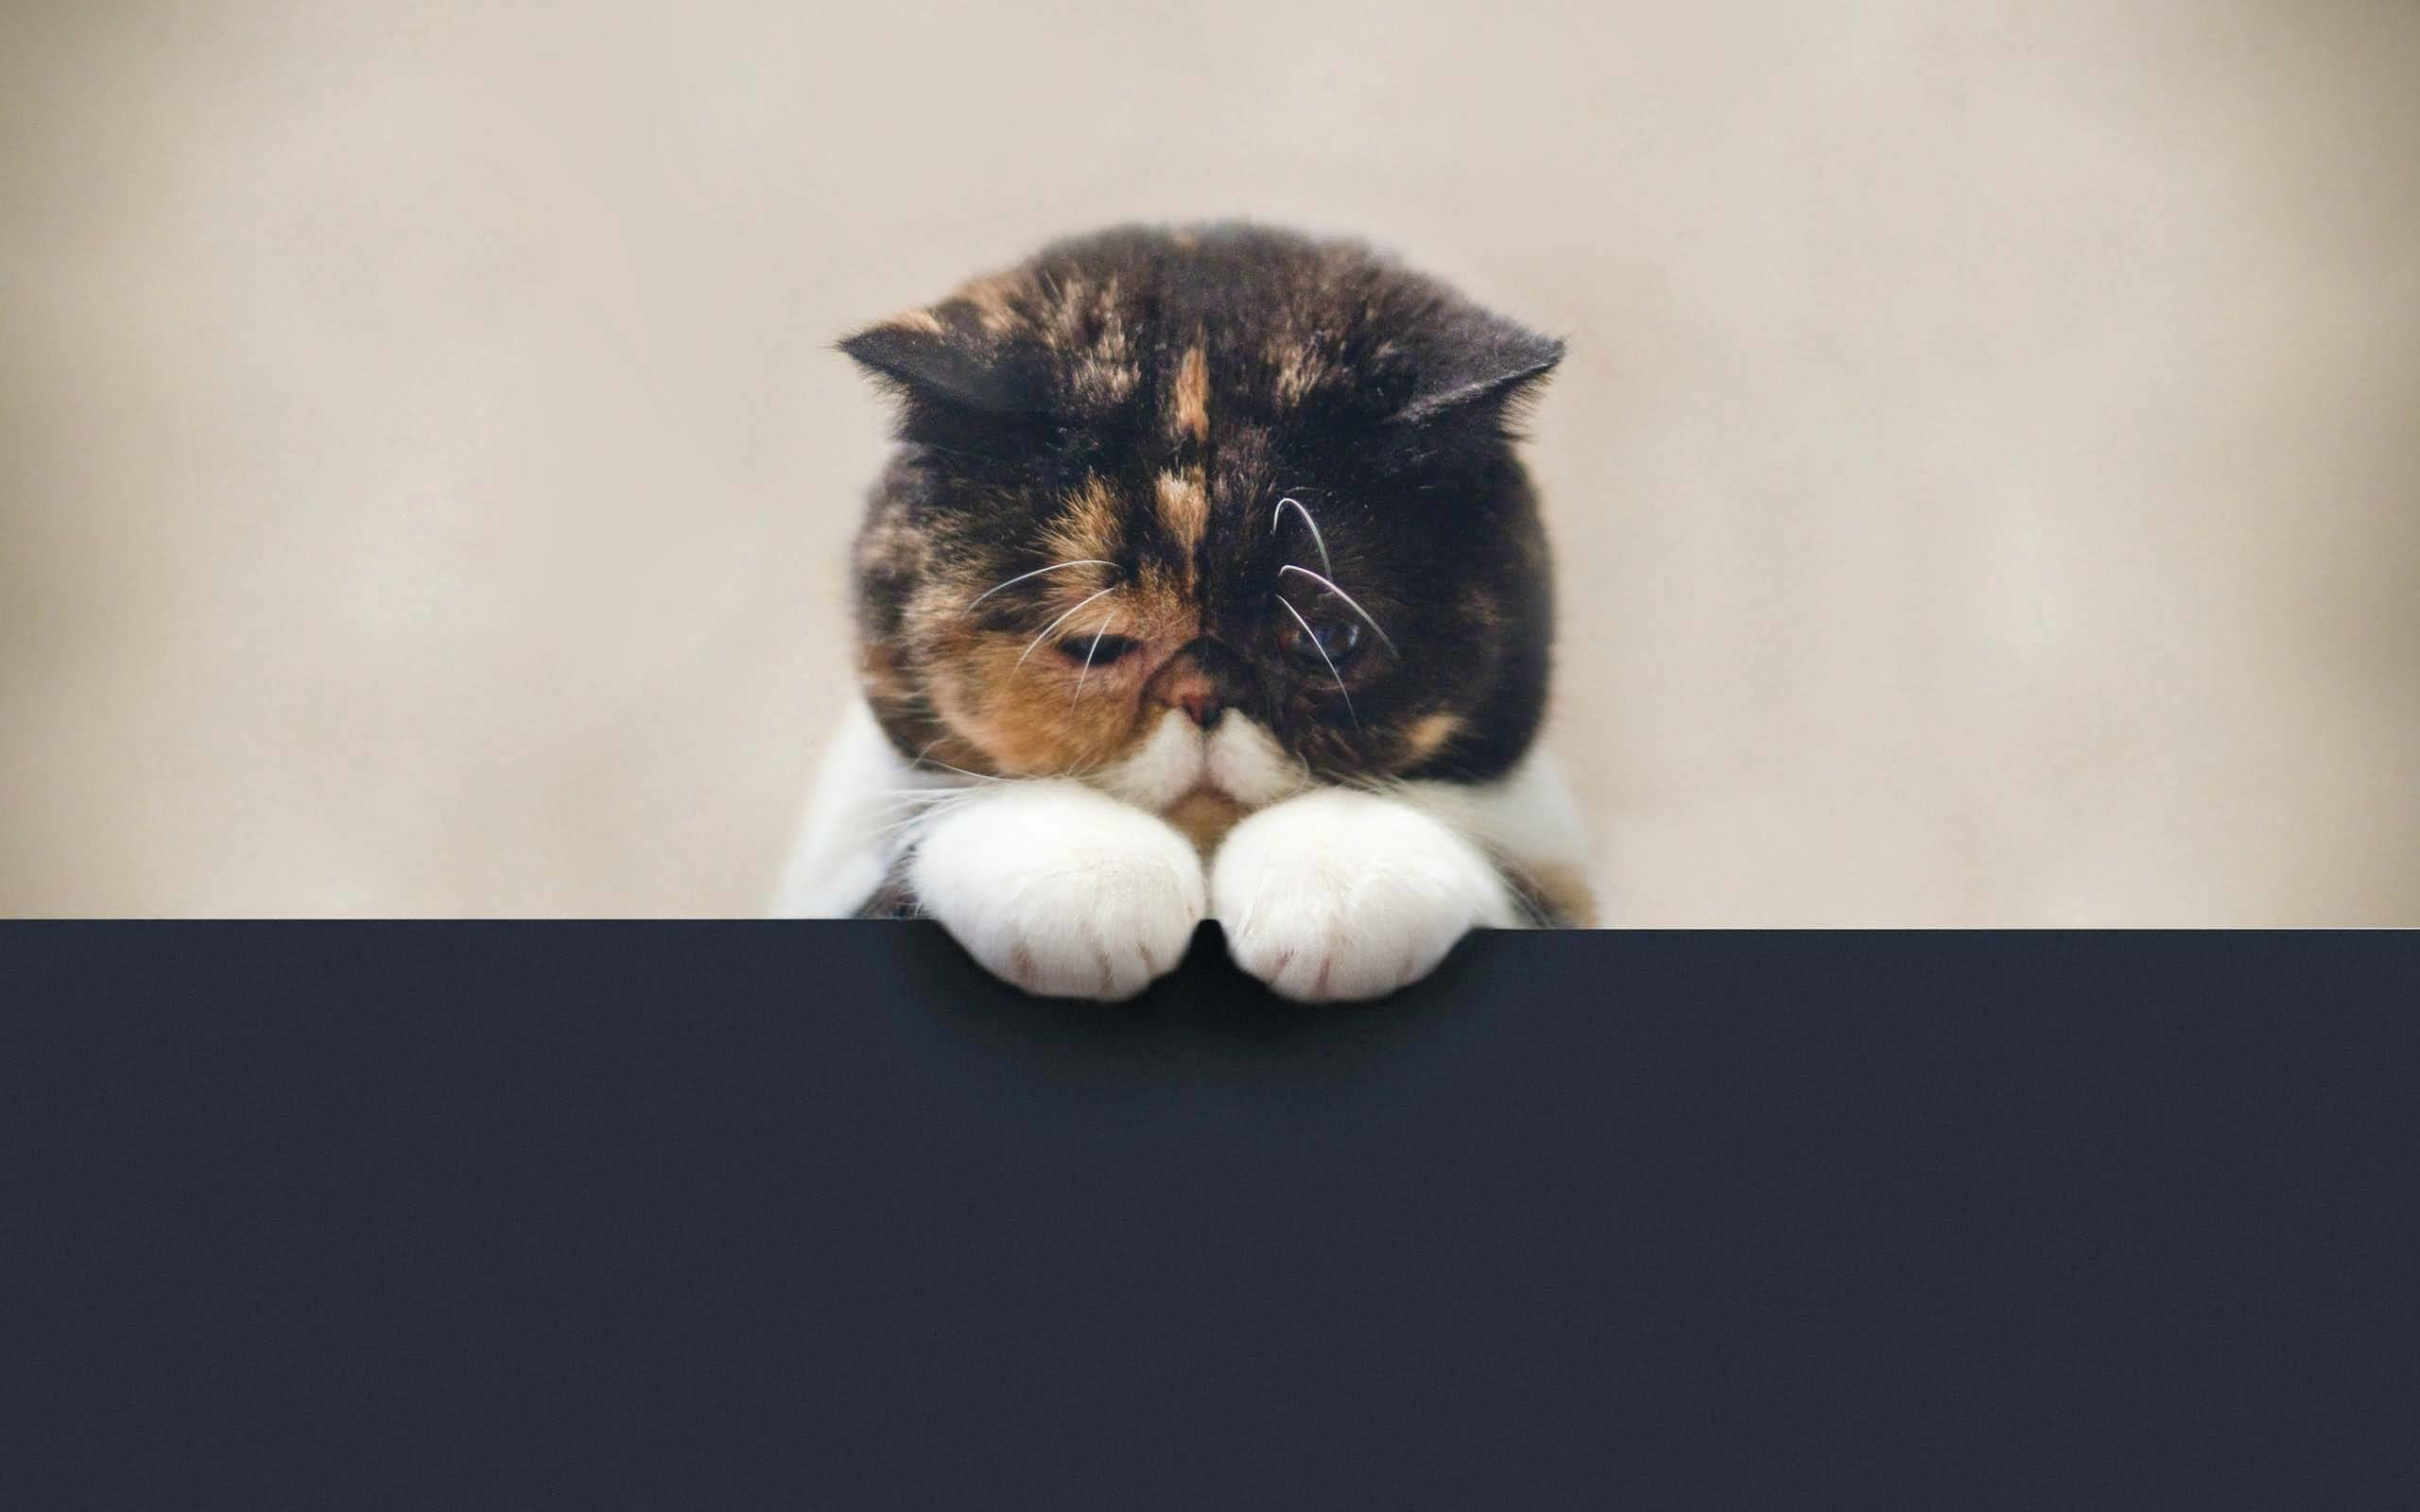 Cute Little Sad Cat Full Hd Wallpaper